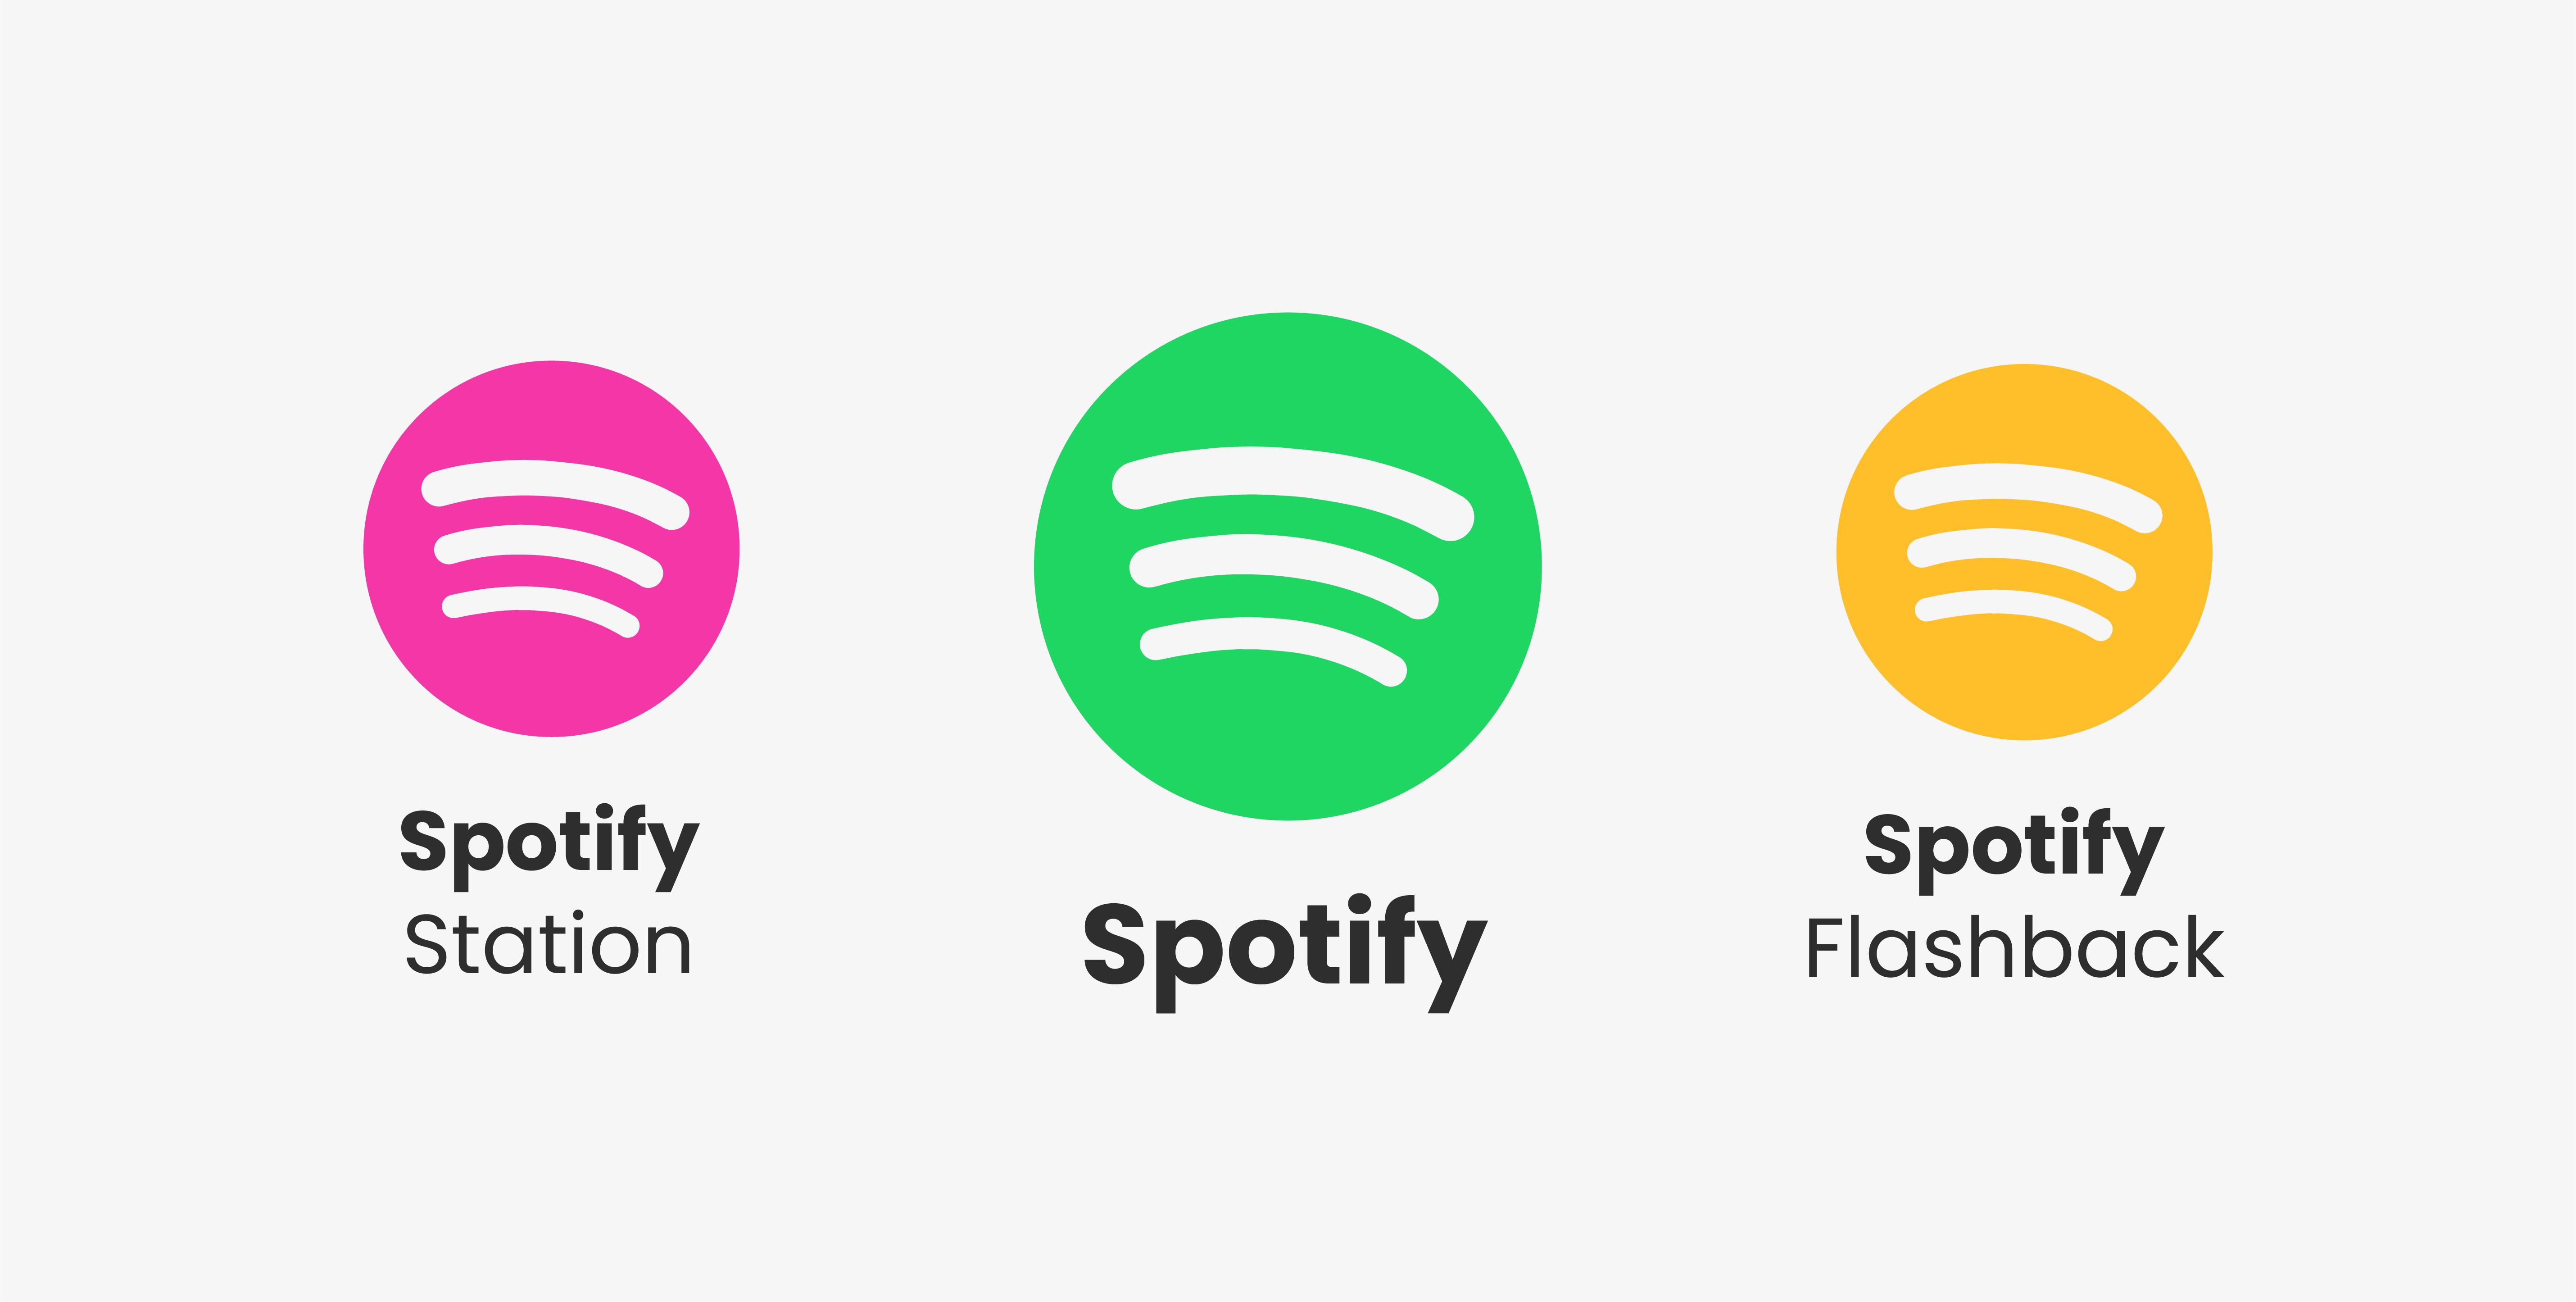 Spotify_SpotifyApp_3